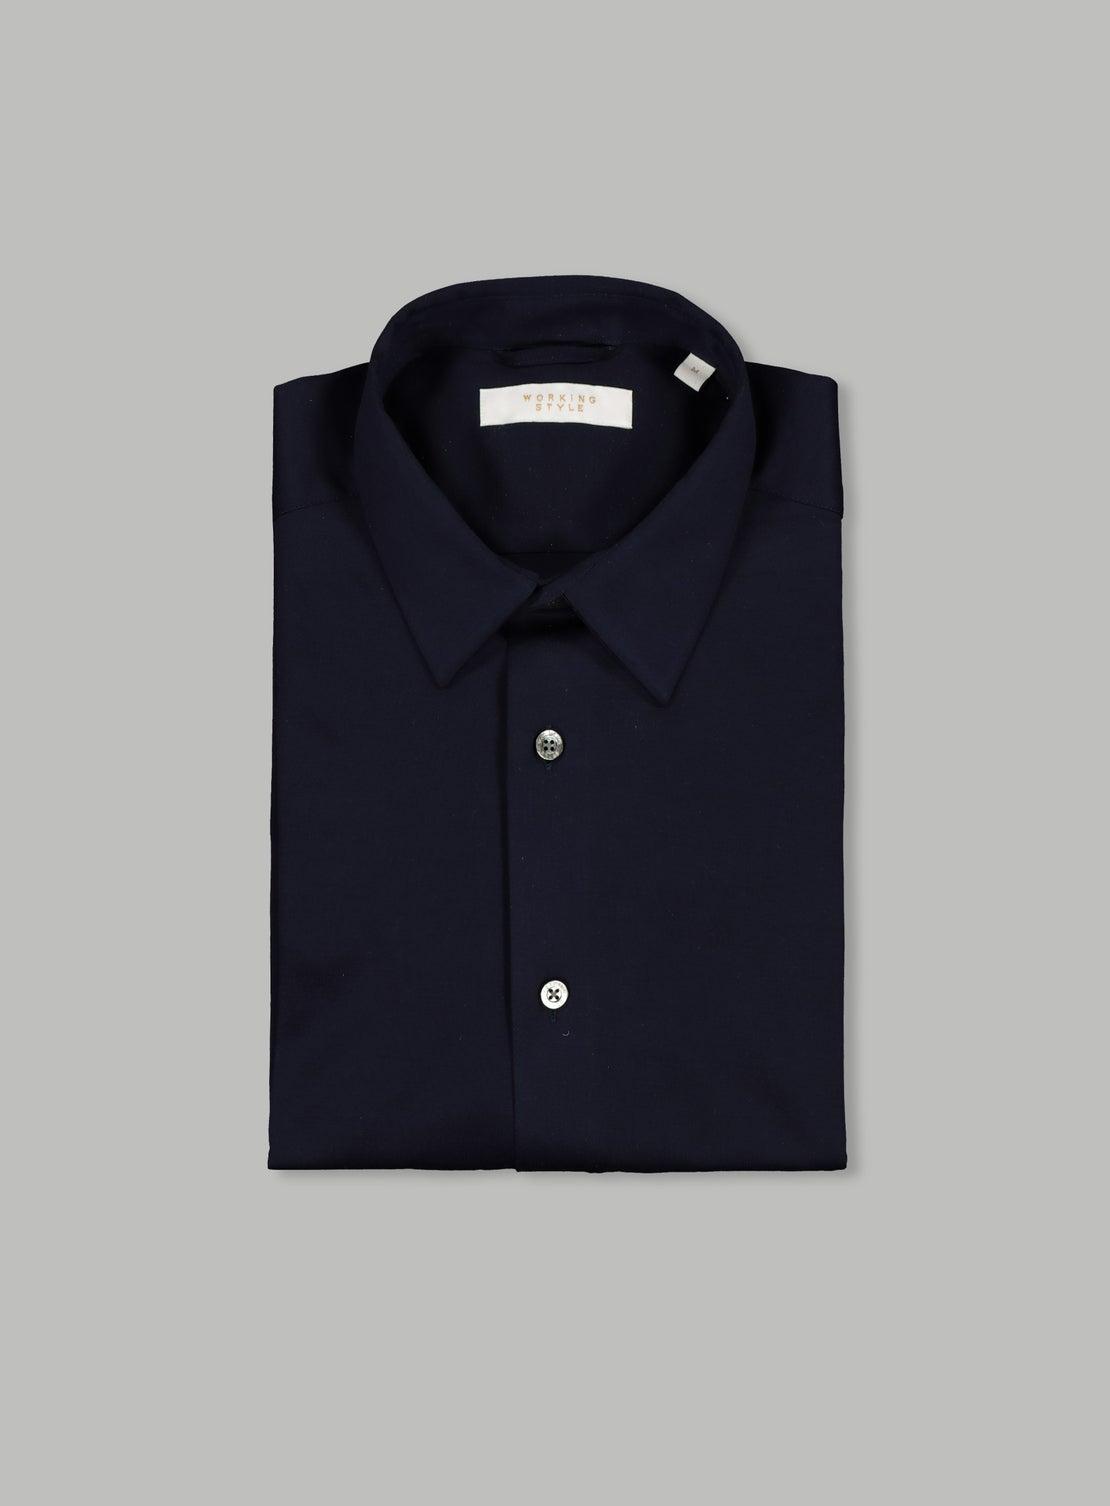 Navy Mercerized Knit Shirt